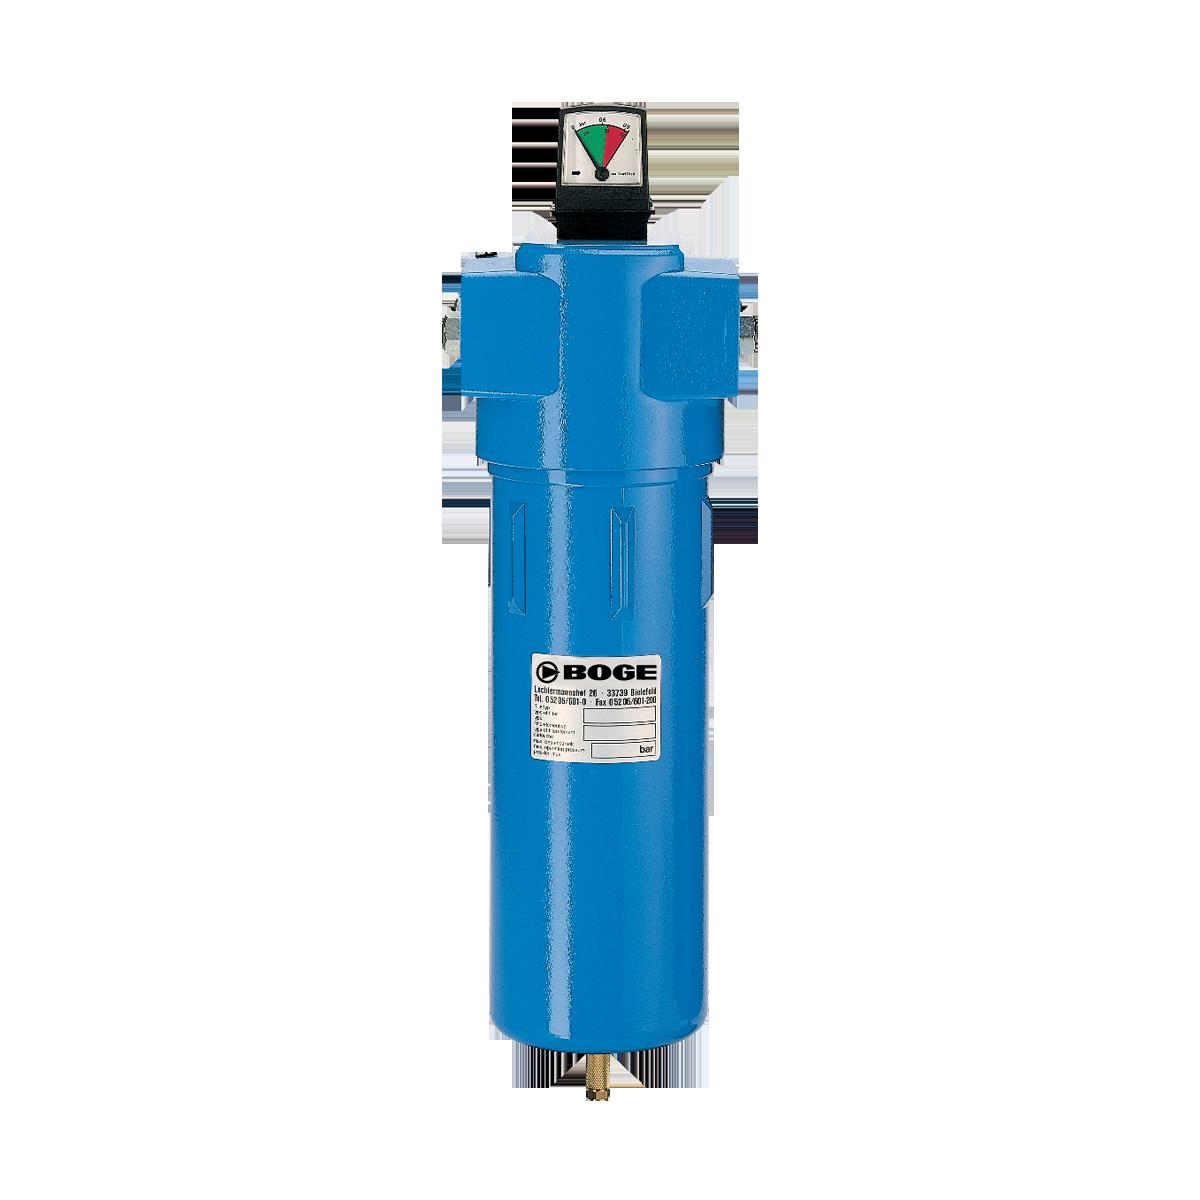 Boge Compressors High Pressure Microfilter 25 Bar